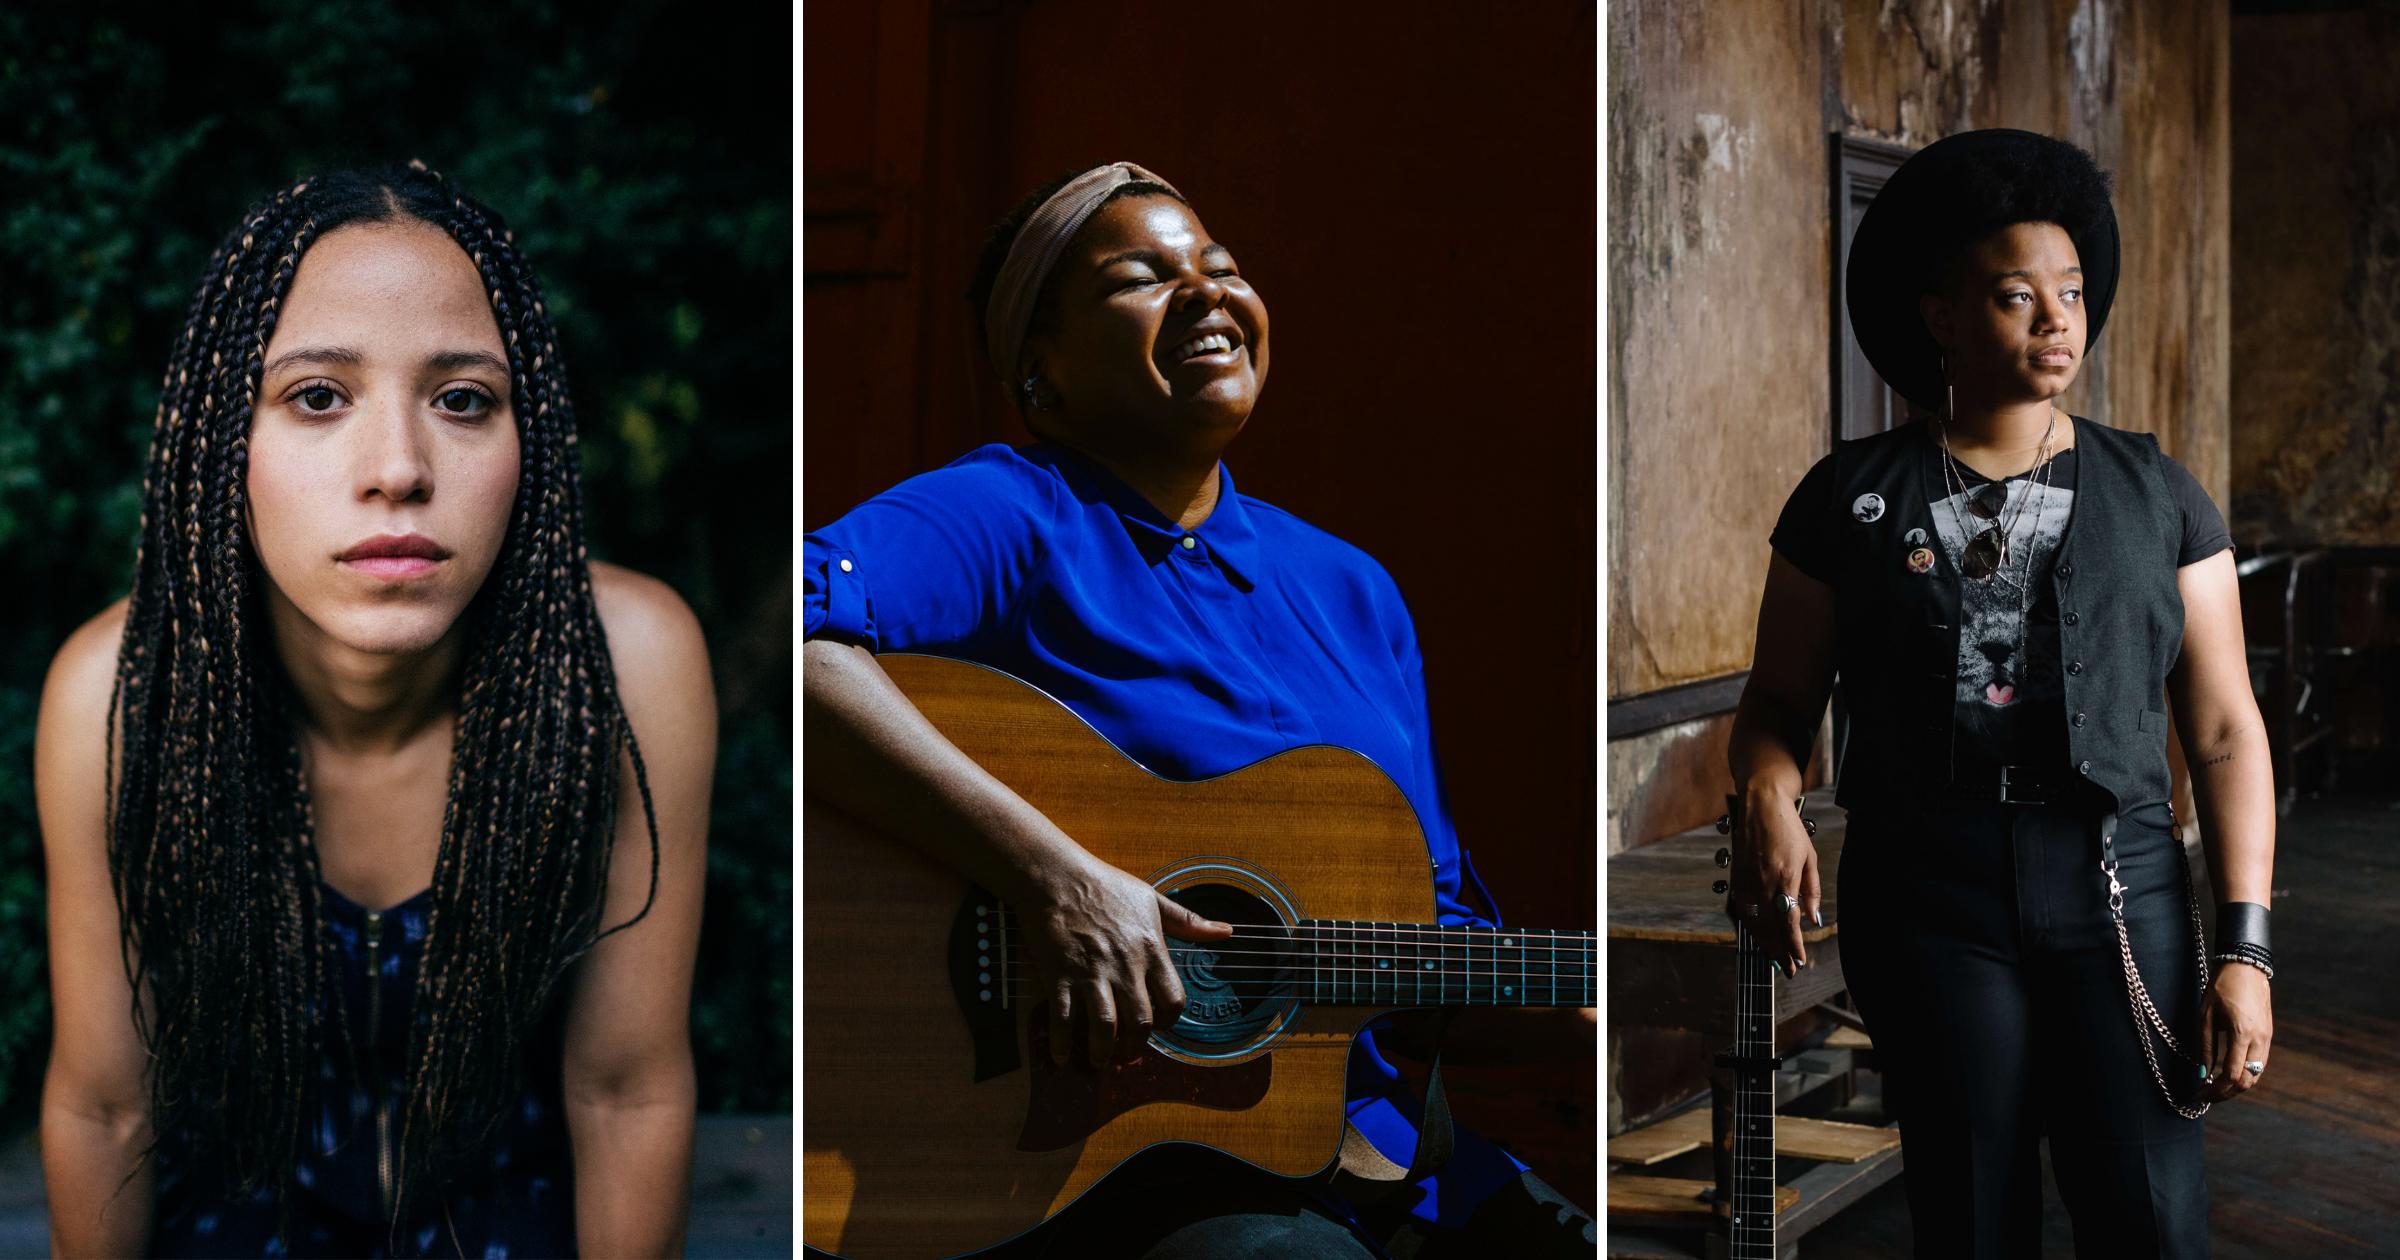 Shout & Shine Online Highlighting Black Roots Artists Set for Oct. 3